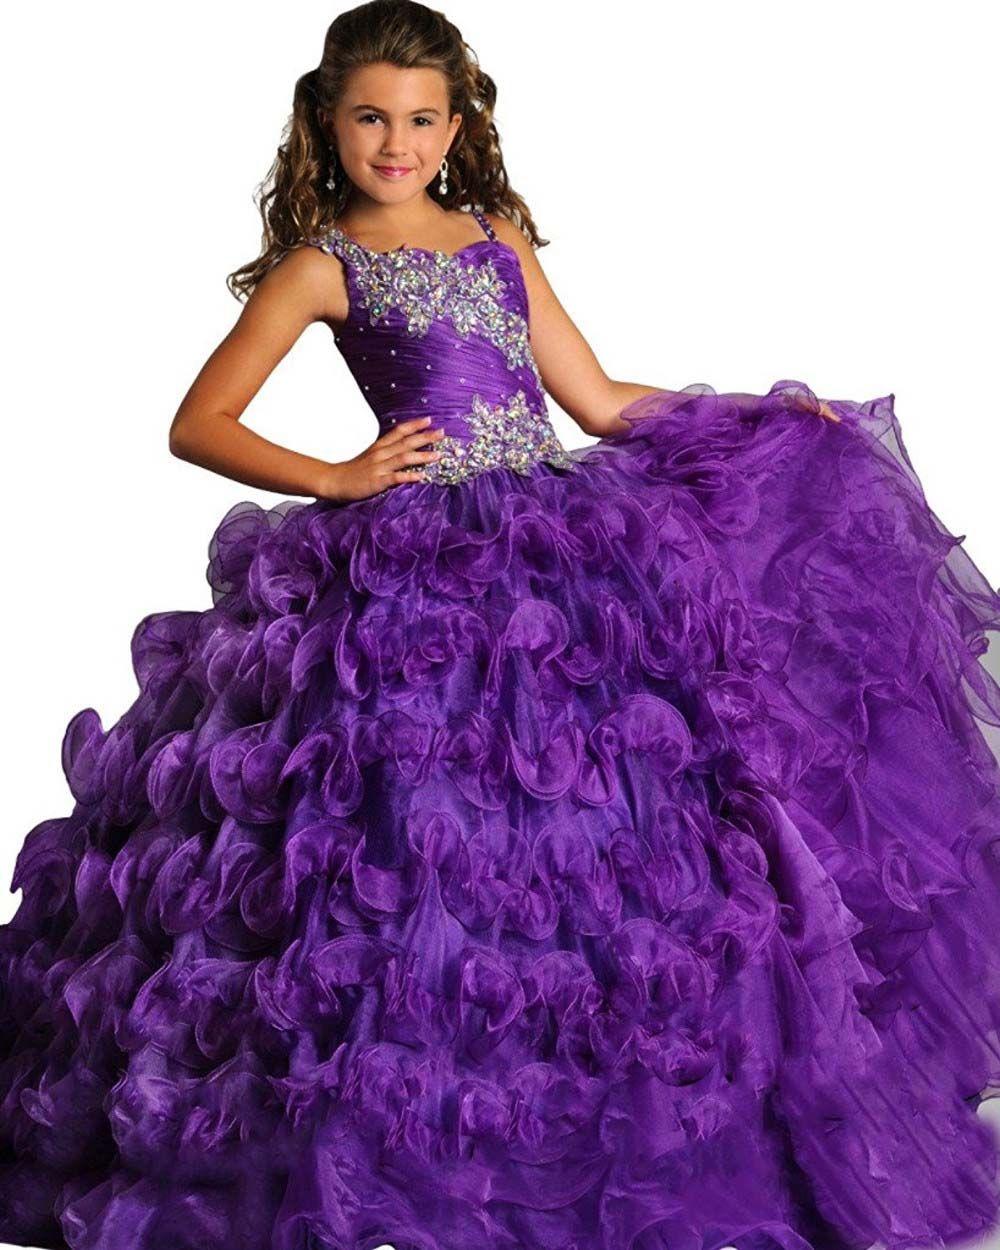 0820f4022 Compre Apliques Hermoso Vestido De Fiesta De Glitz Púrpura Para Niñas  Tamaño 8 12 Largo Corsé Fiesta De Baile Vestido De Fiesta Niños Turquesa  Vestidos De ...